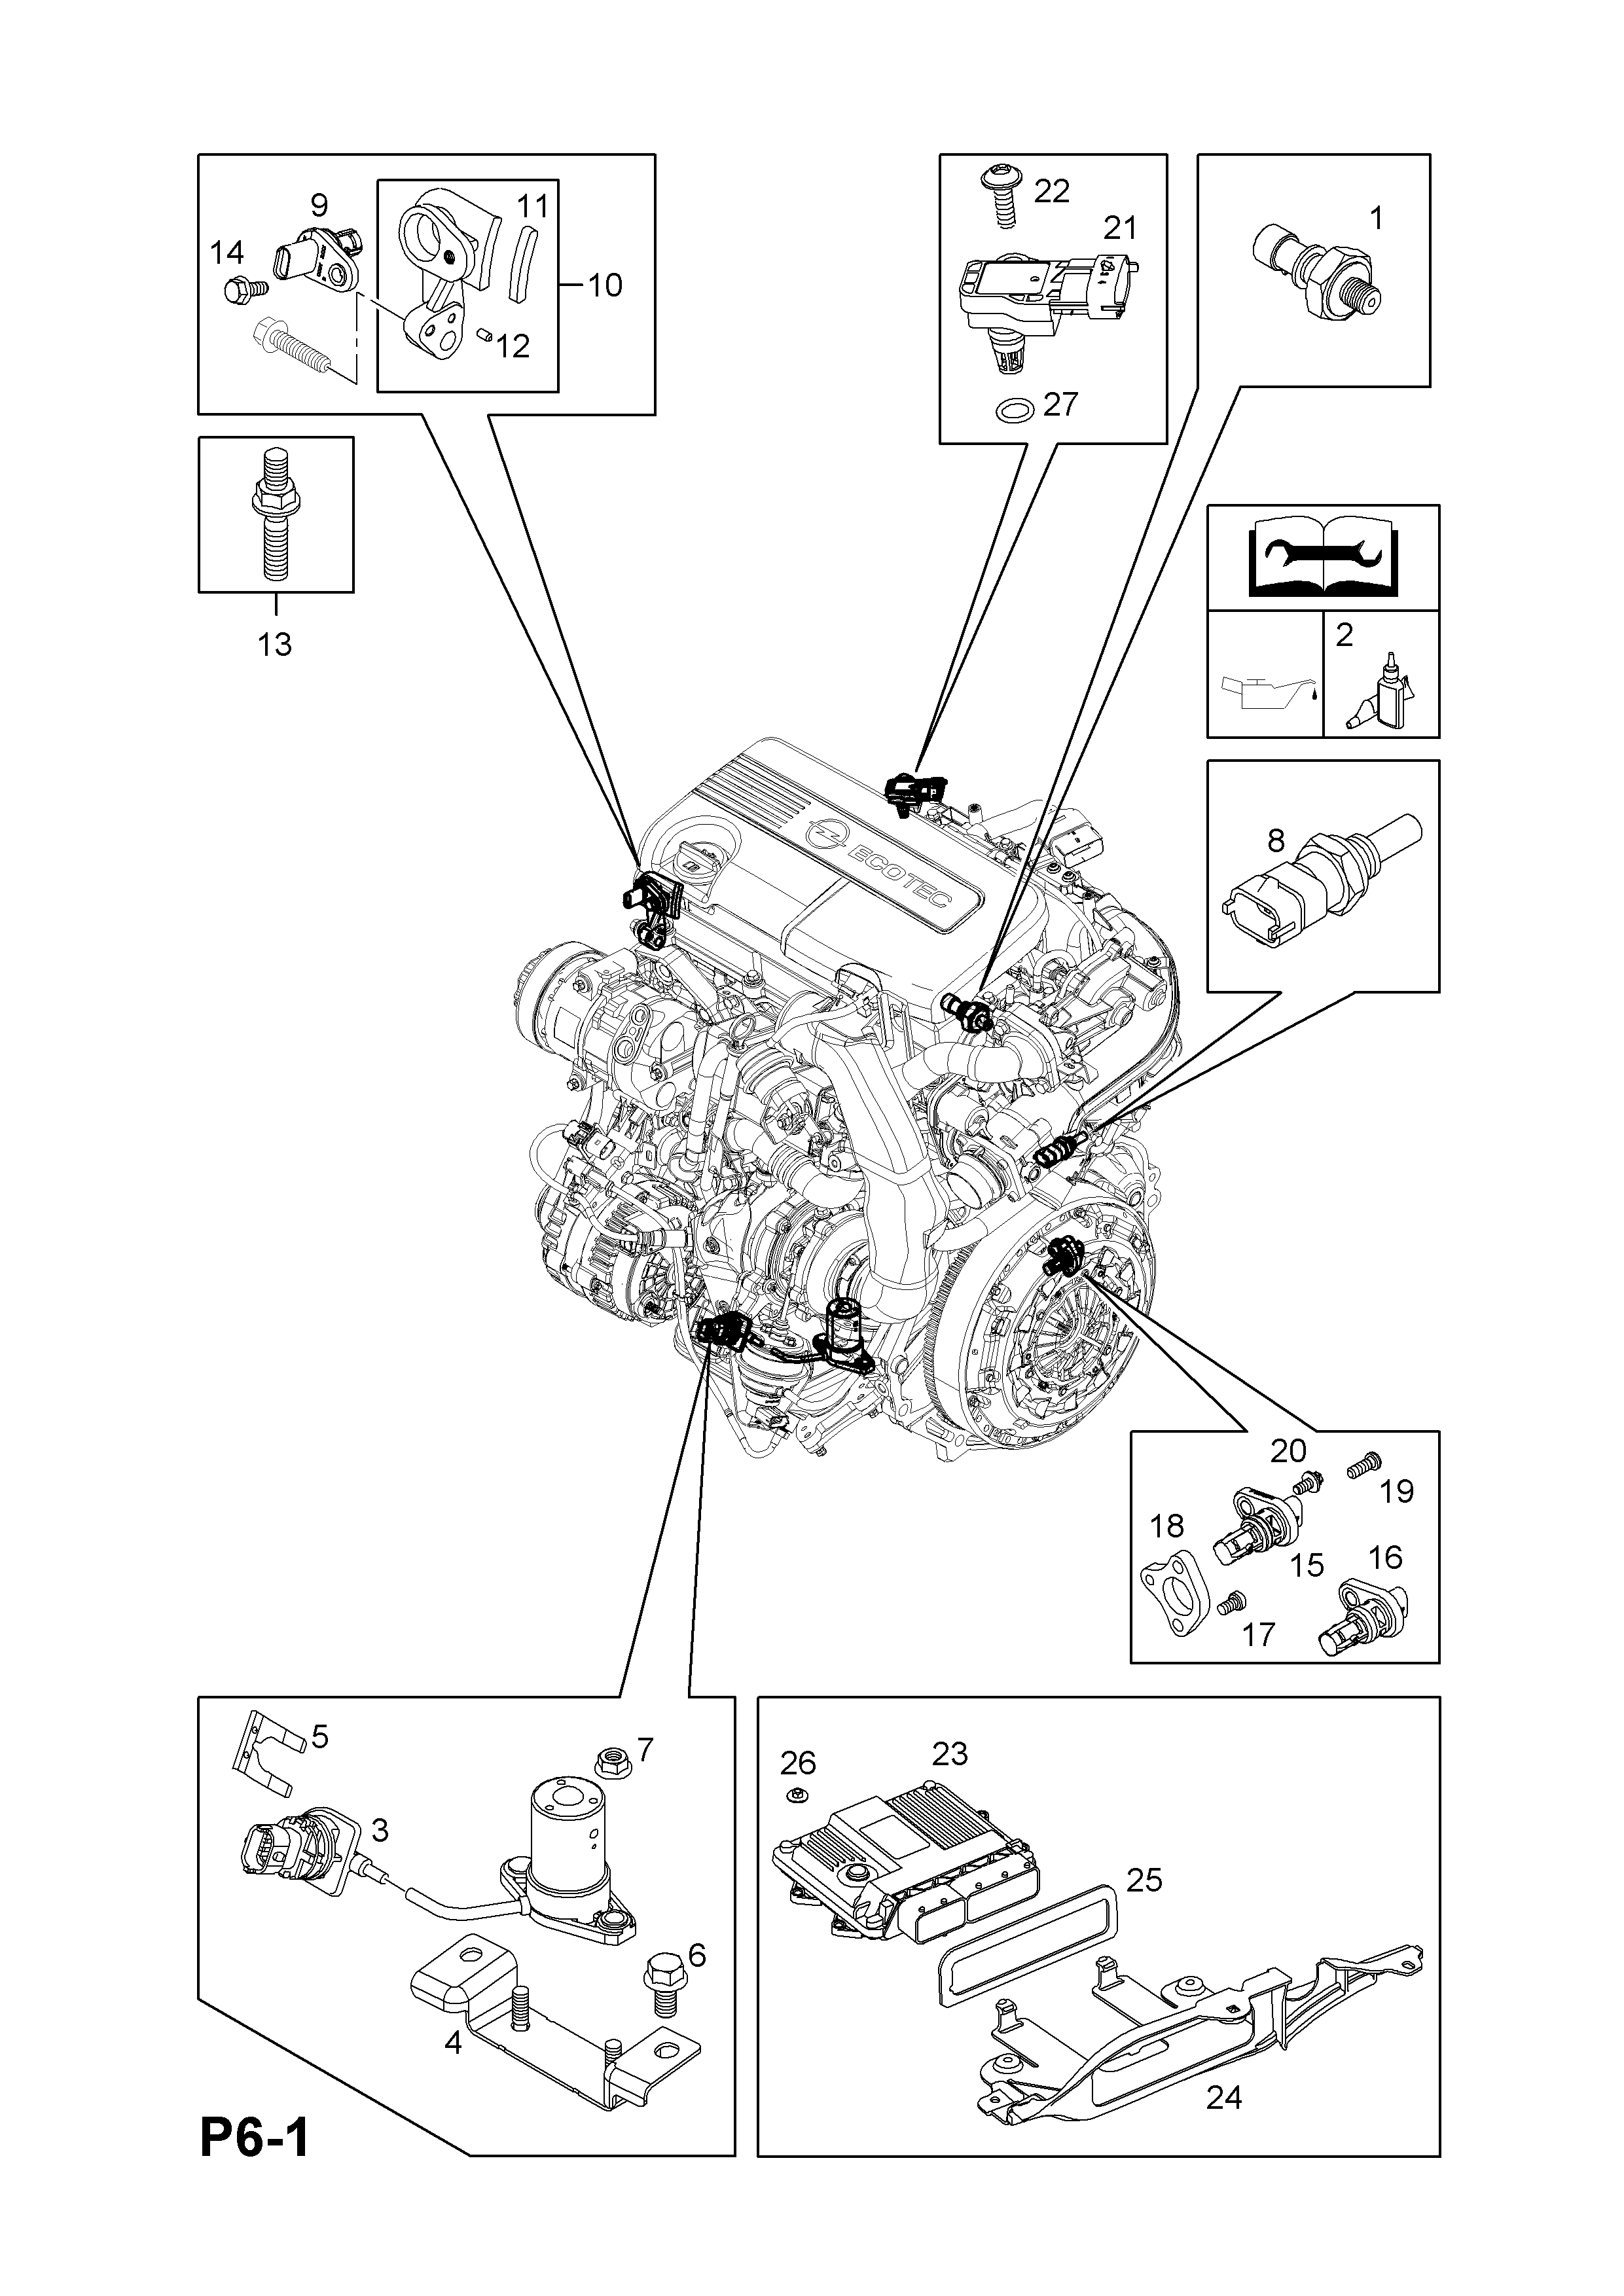 Opel Corsa D 2007 P Electrical 1 Engine And Cooling 93 Gm Ecotec Diagram Part Number Genuine Description Range